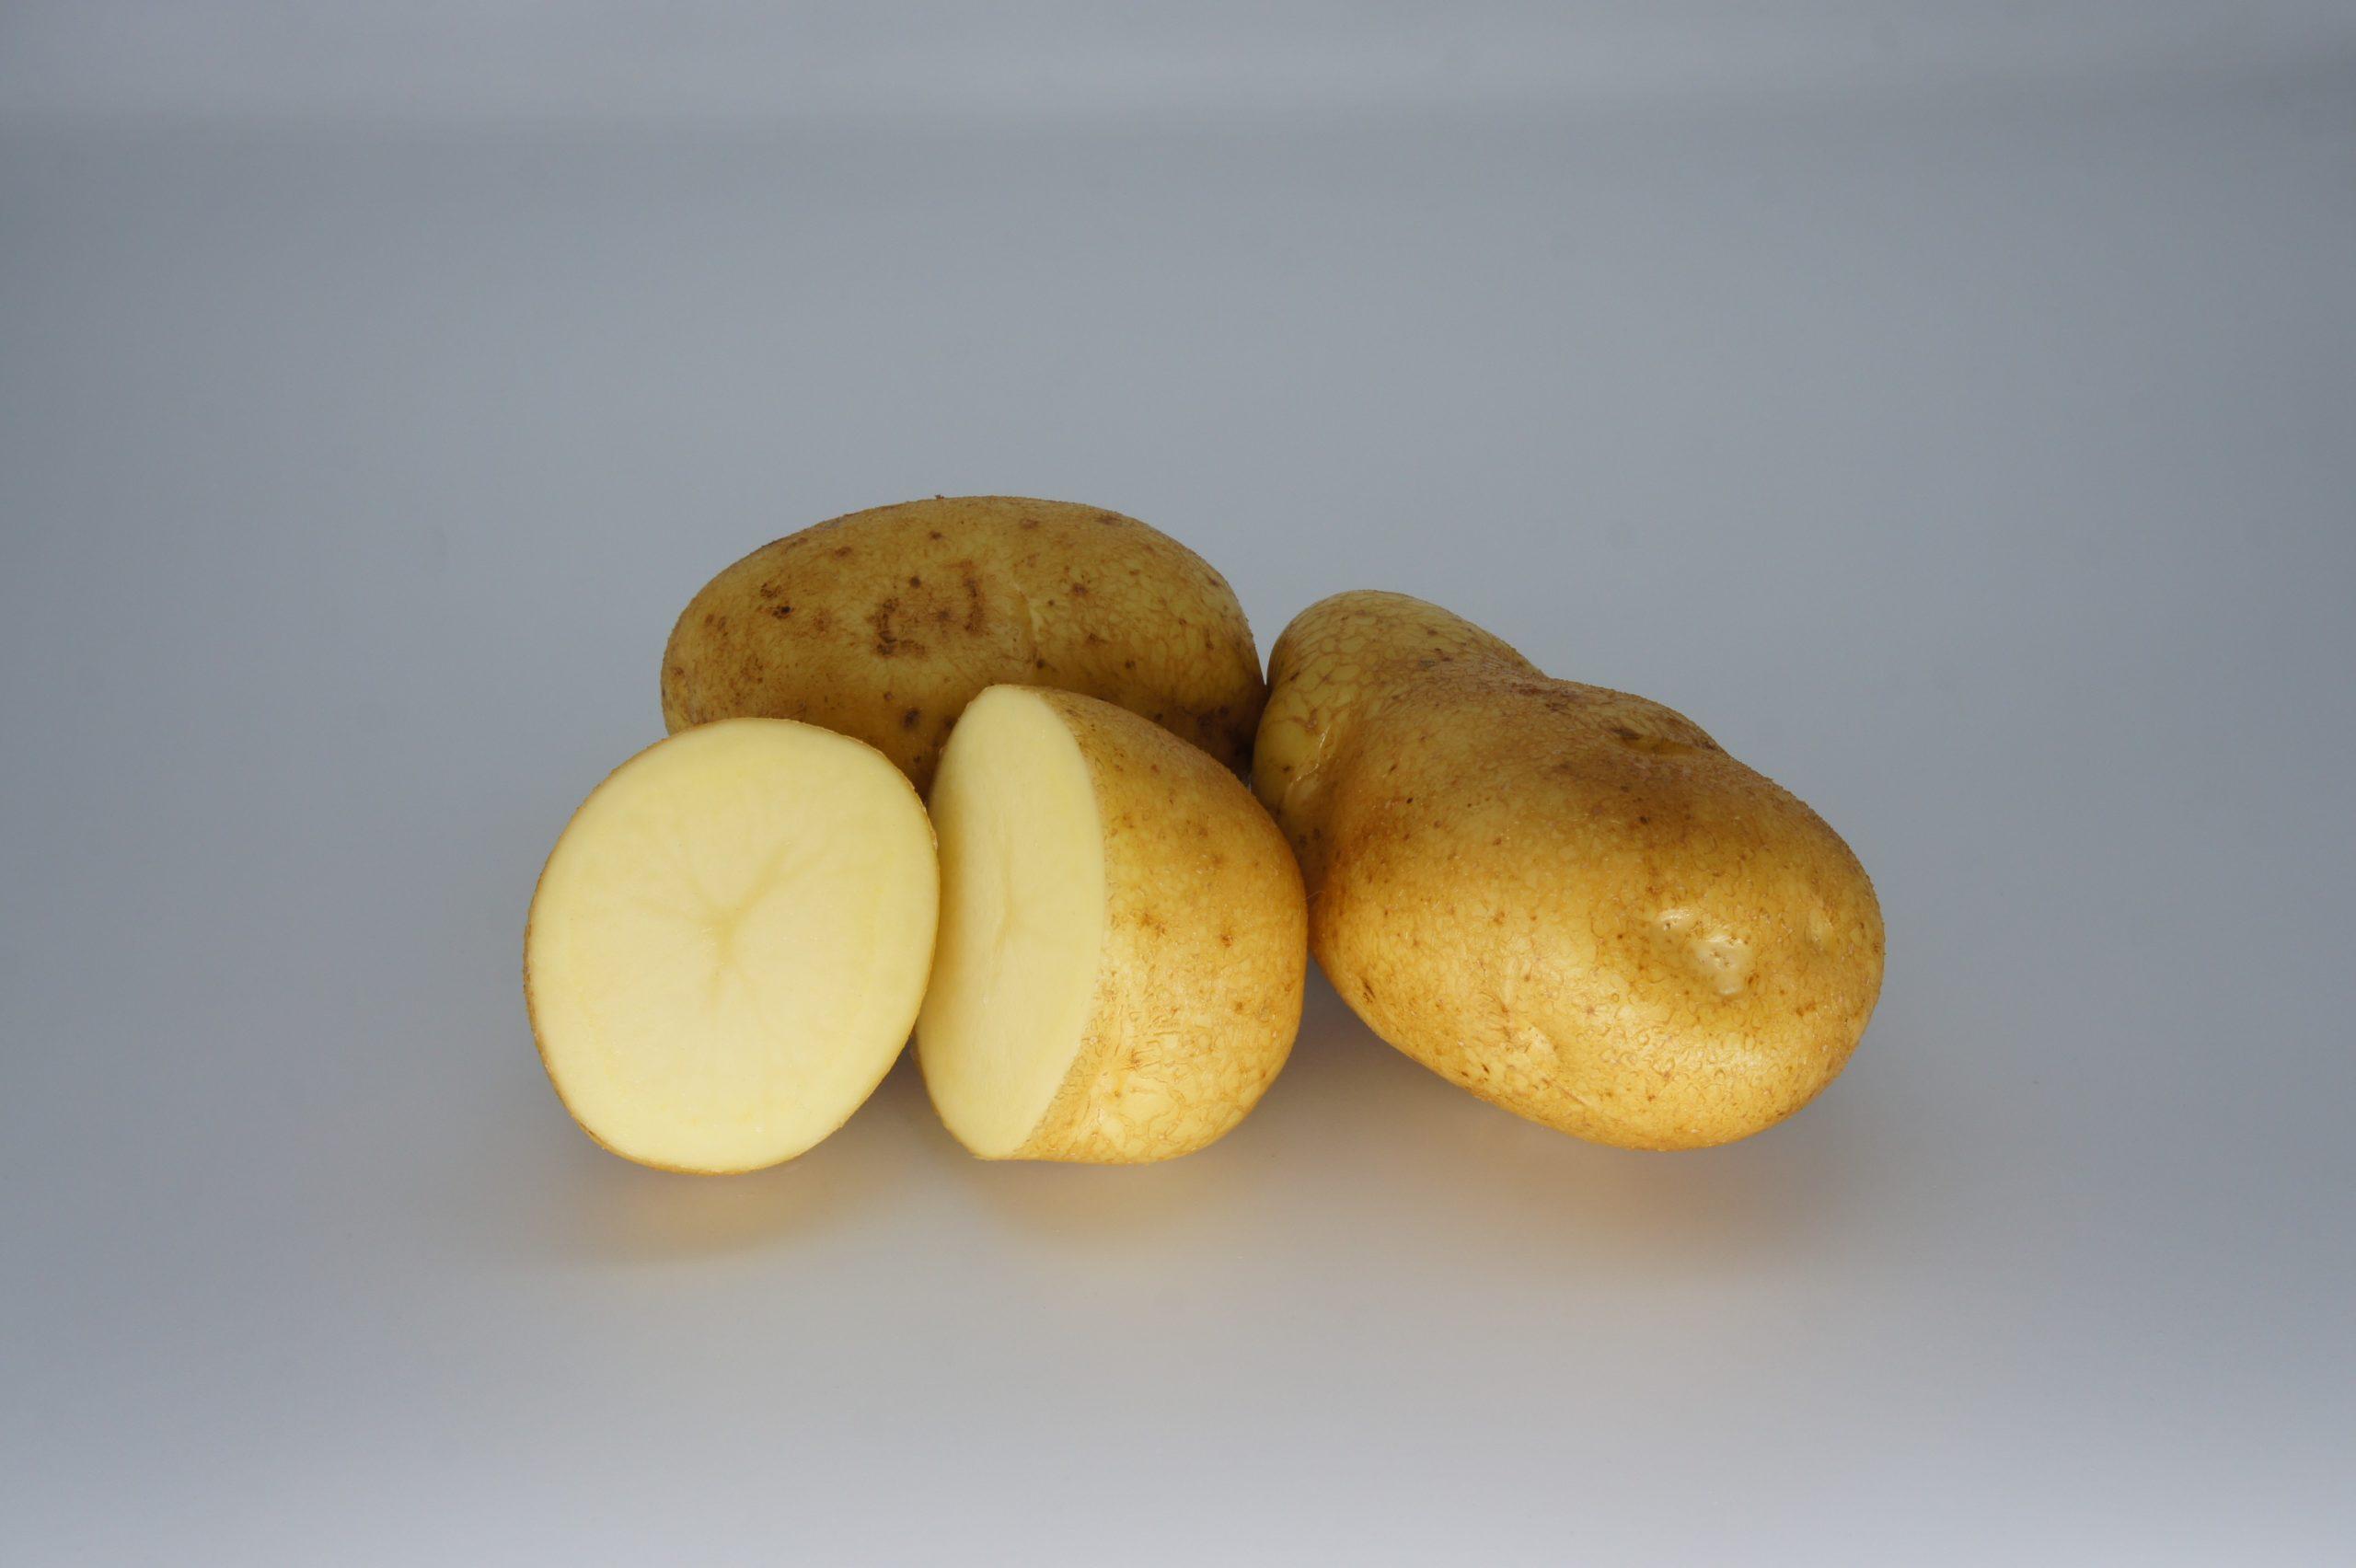 Wilja 2020 The Potato Shop